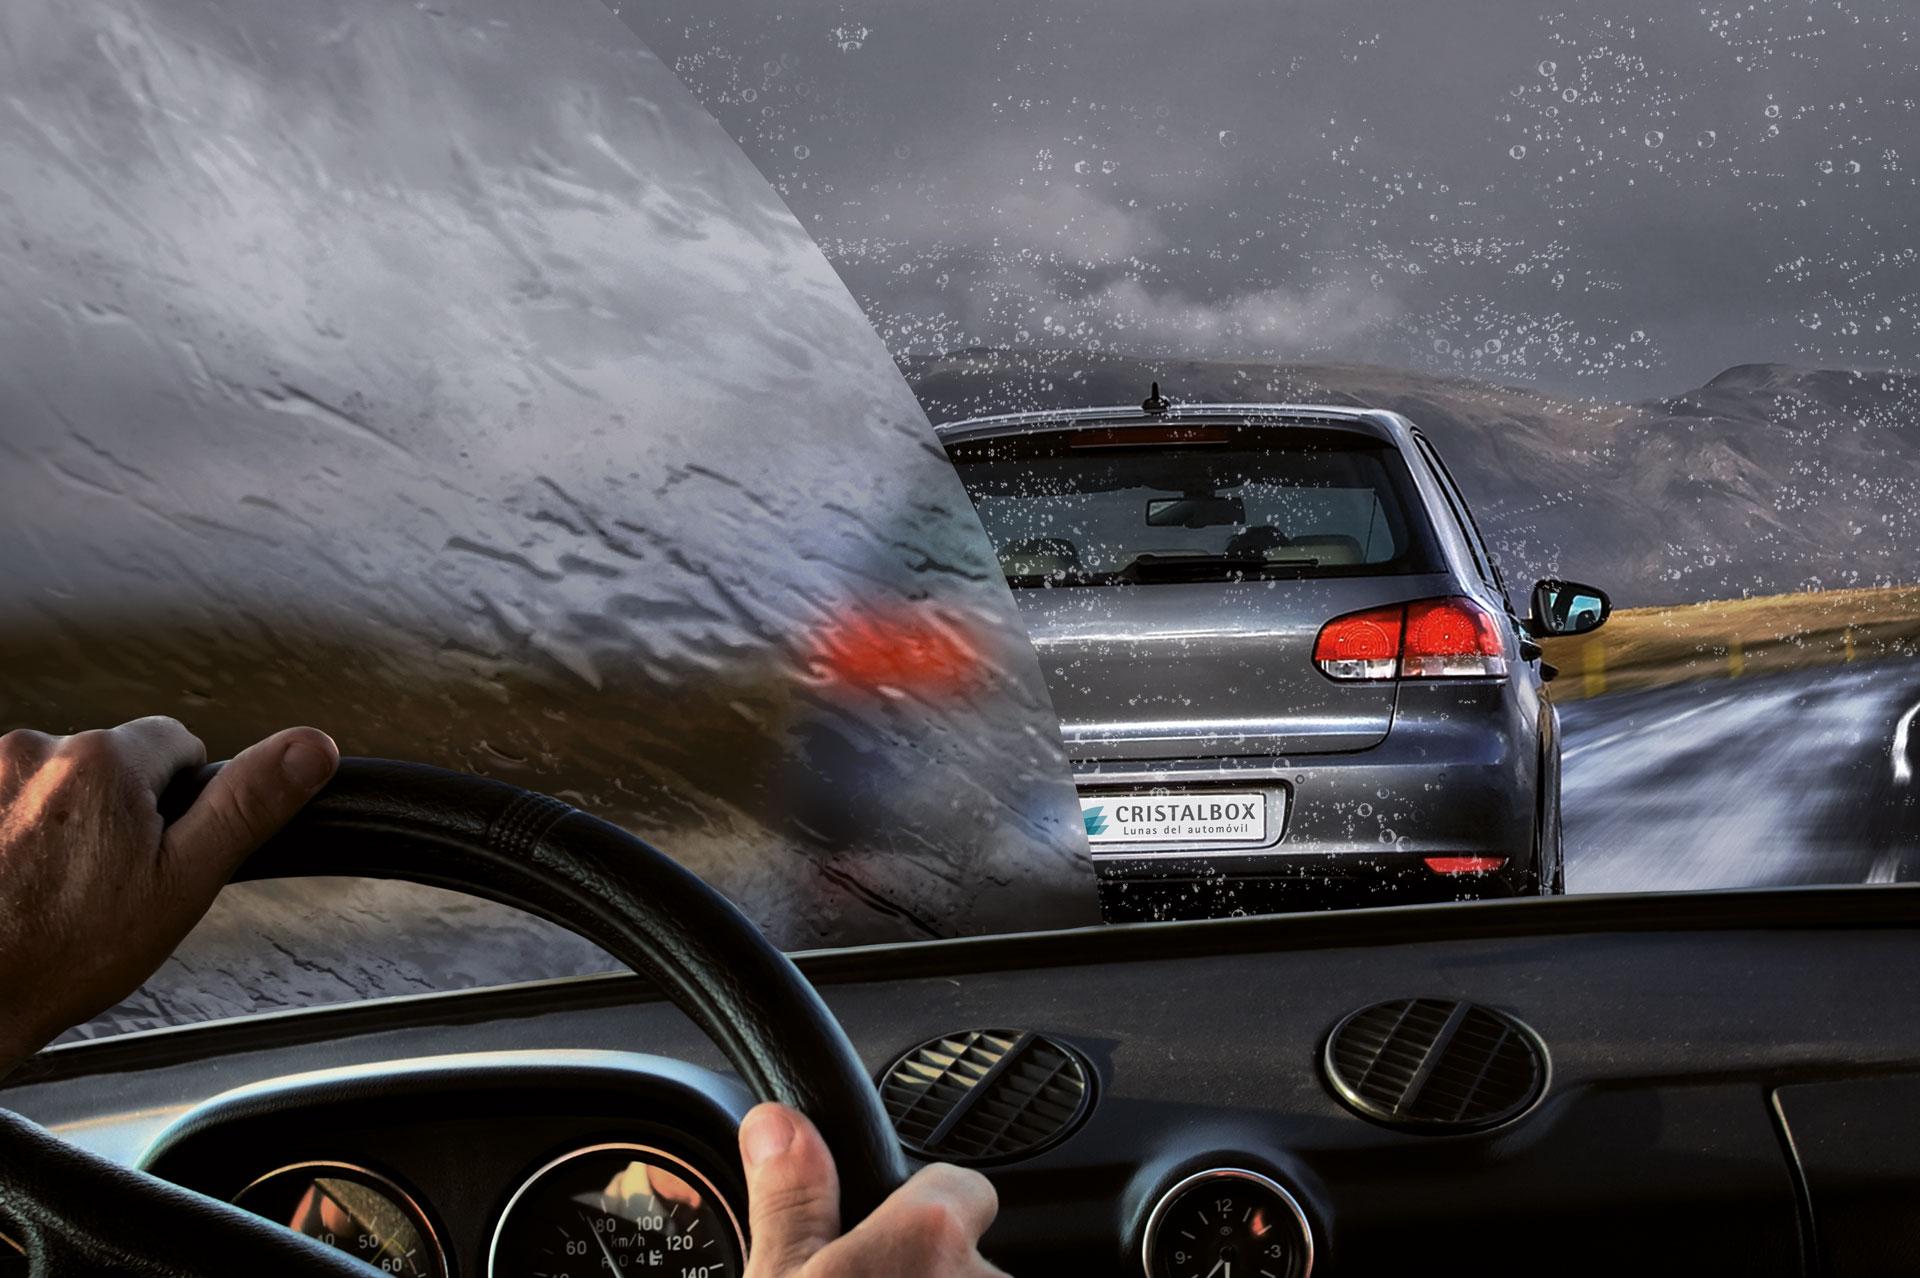 Tratamiento  Anti lluvia cristales coches gratis